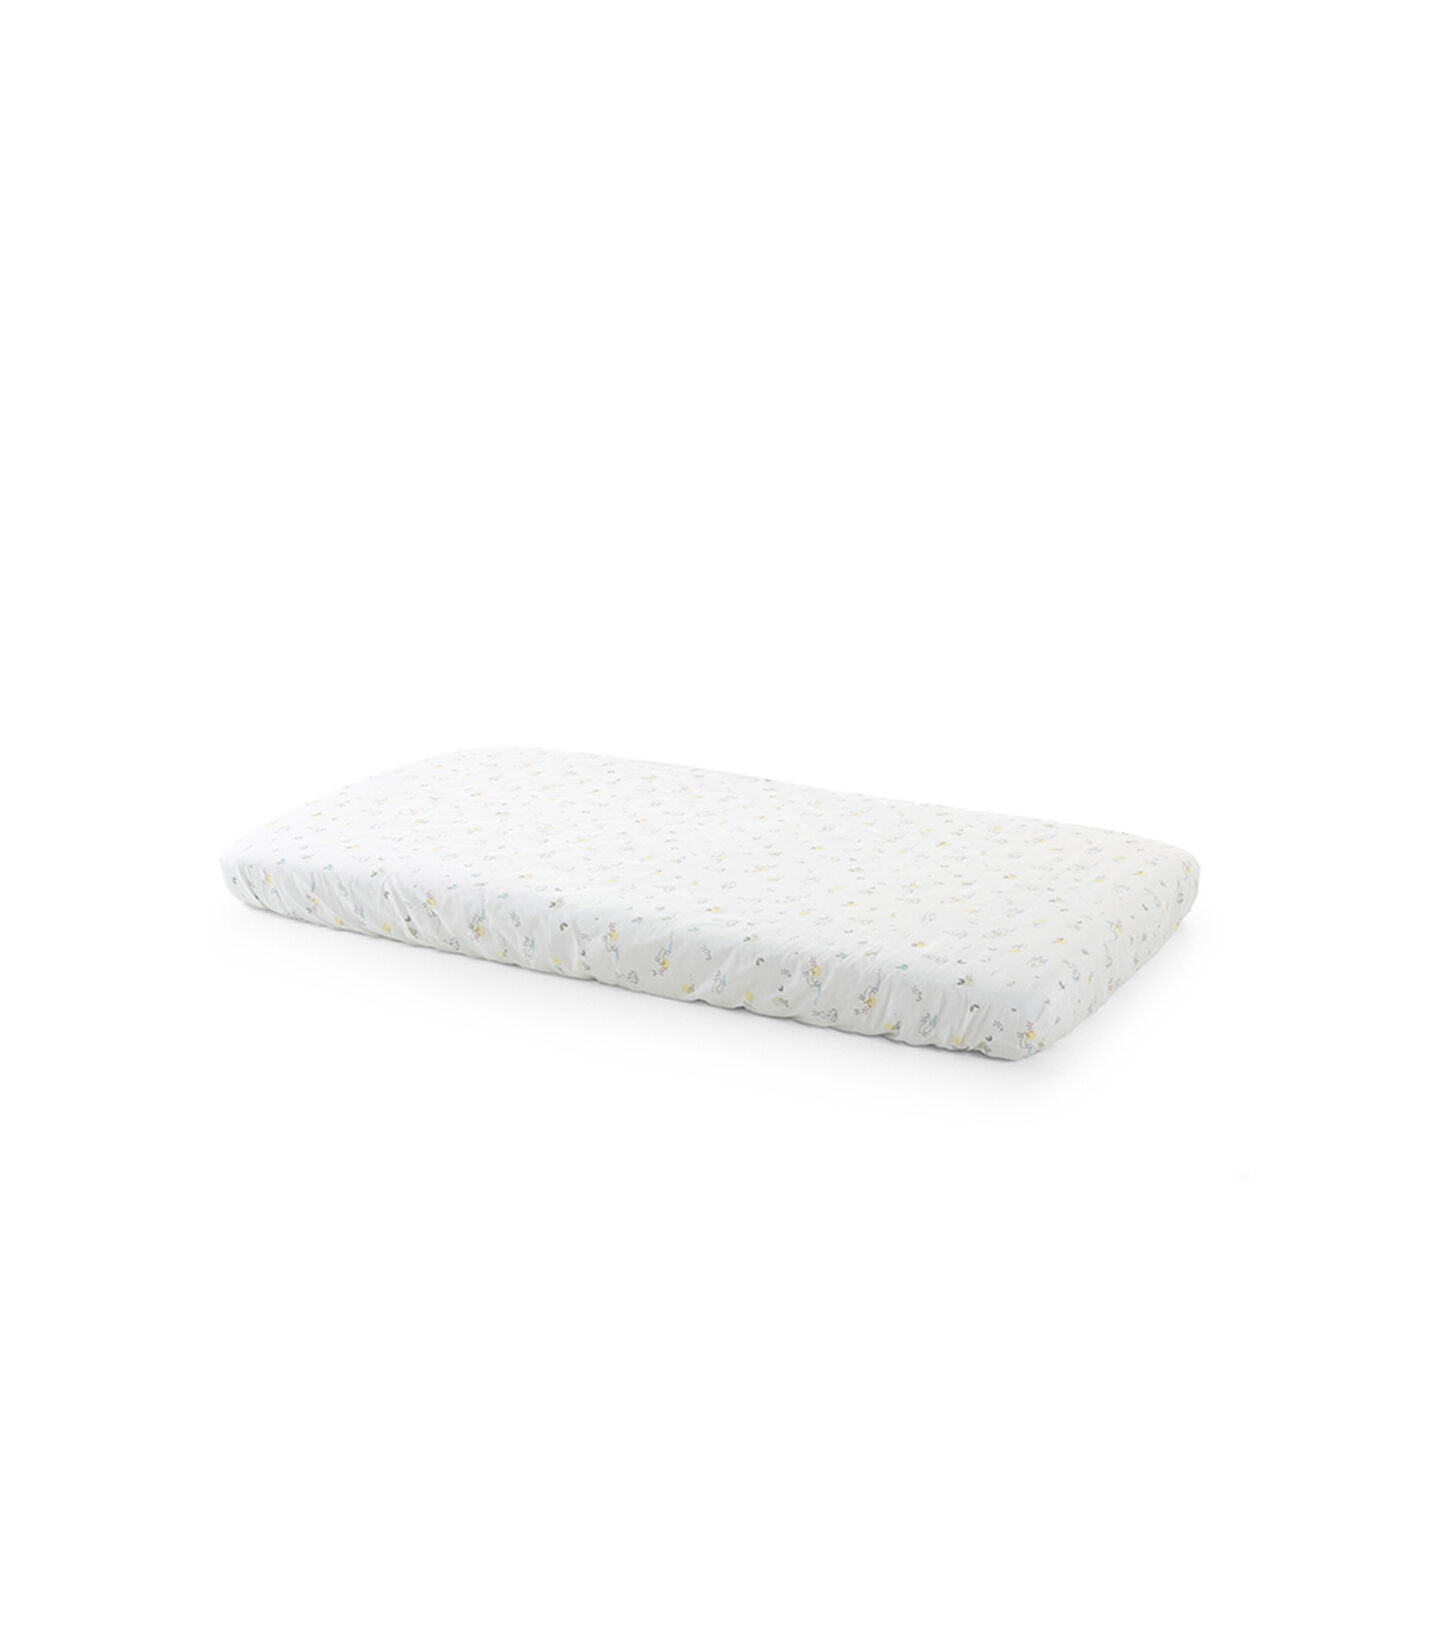 Stokke® Home™ Bed Spannbettlaken, 2-teilig - Soft Rabbit, Soft Rabbit, mainview